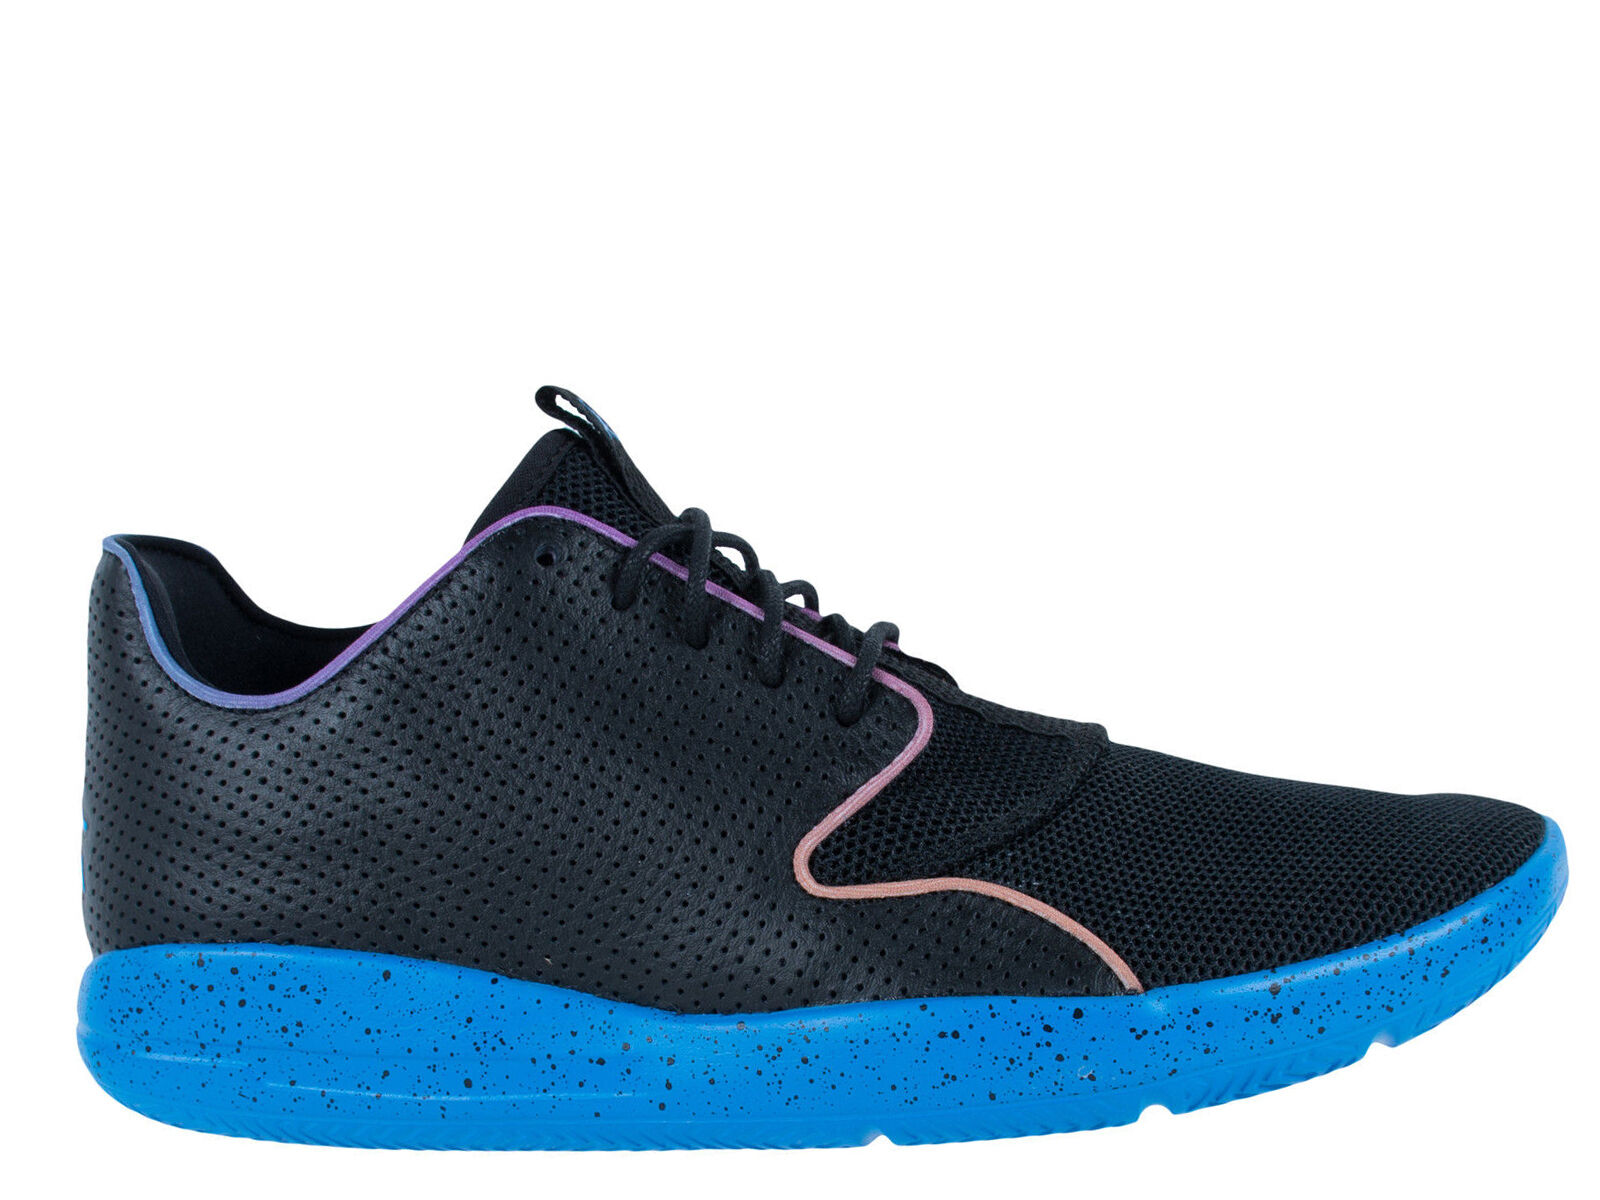 Uomo Brand New New New Jordan Eclipse Athletic Fashion Everyday scarpe da ginnastica [724010 029] 6f9062